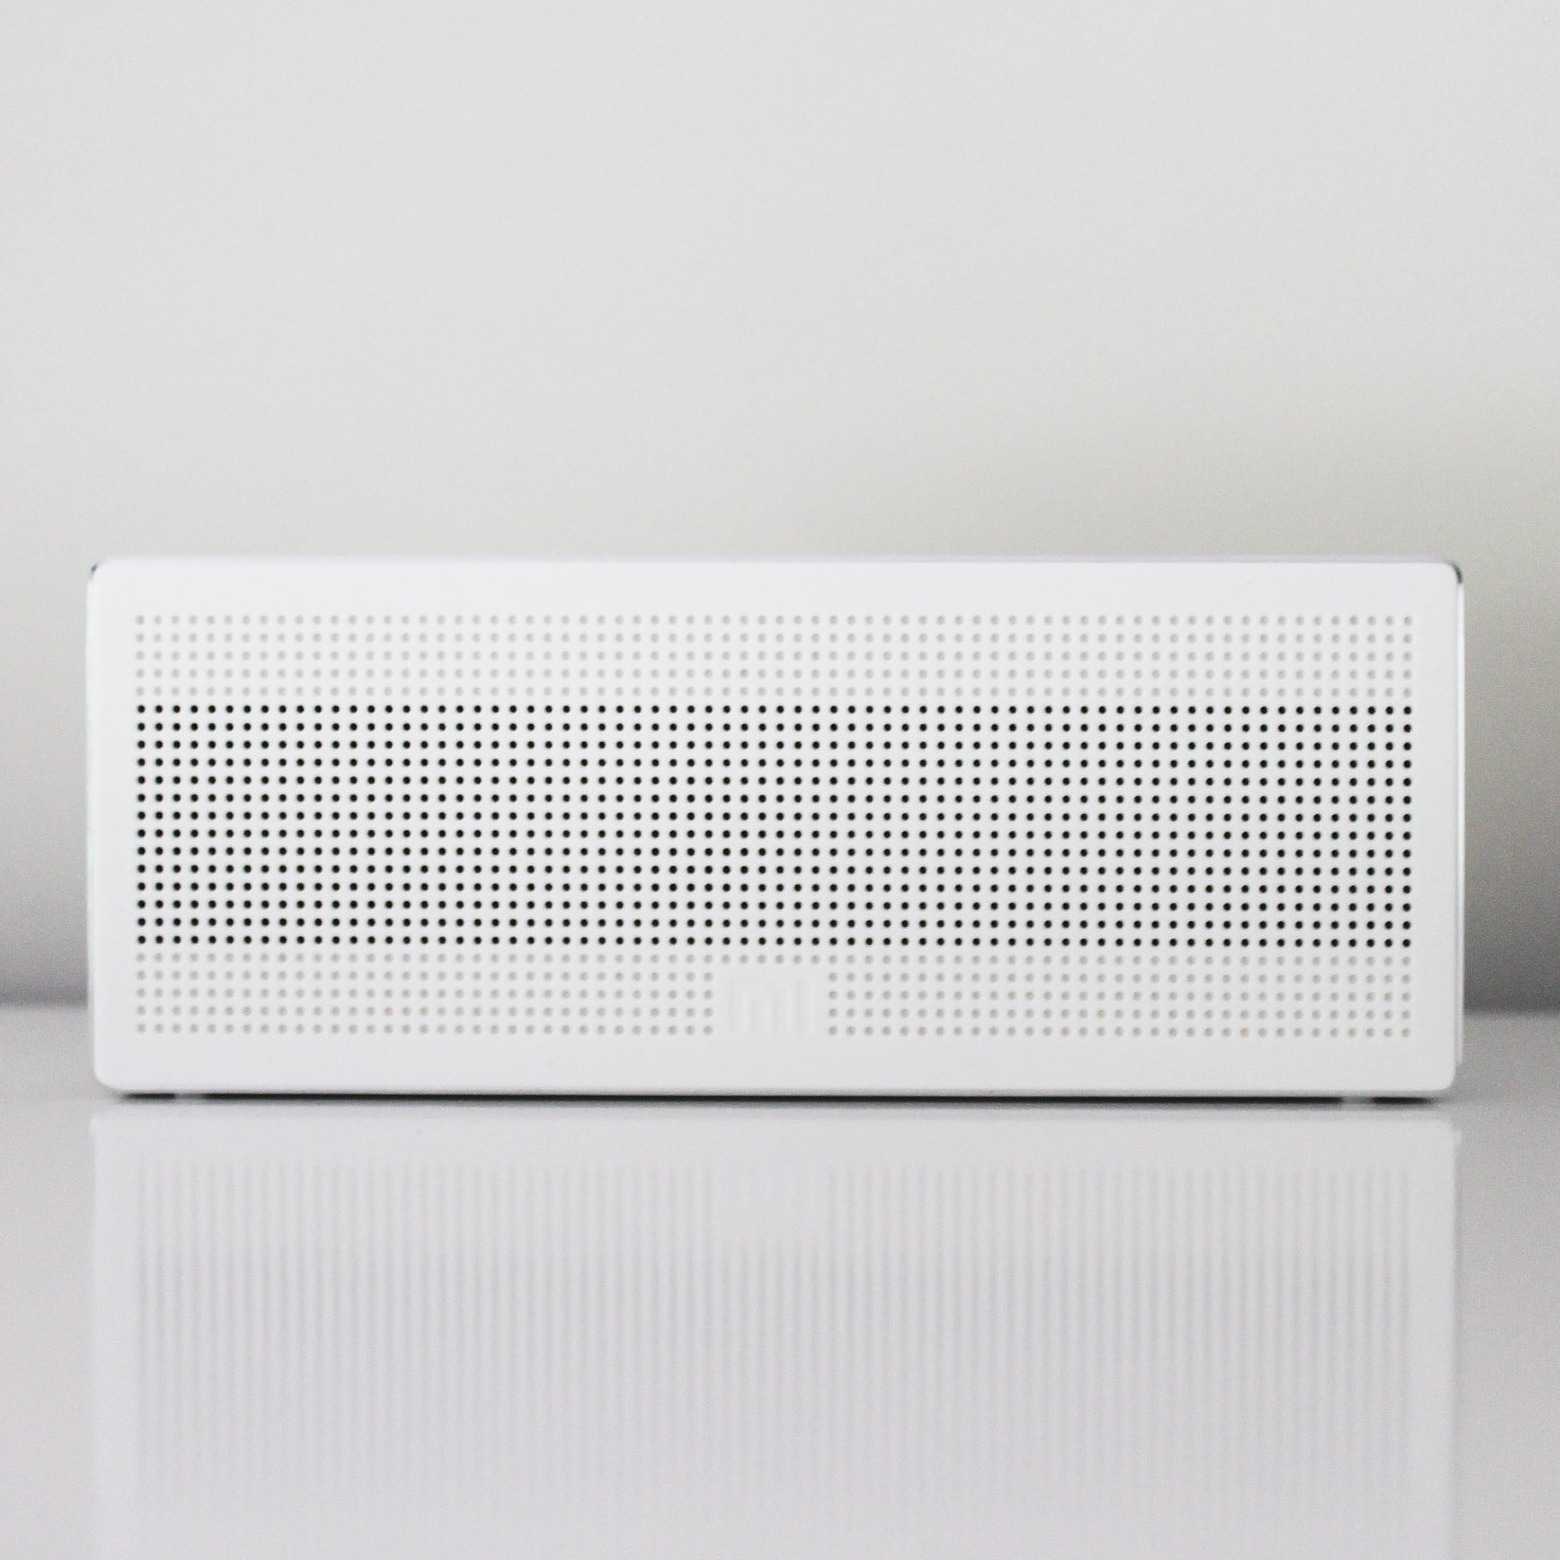 App-based air conditioner controls